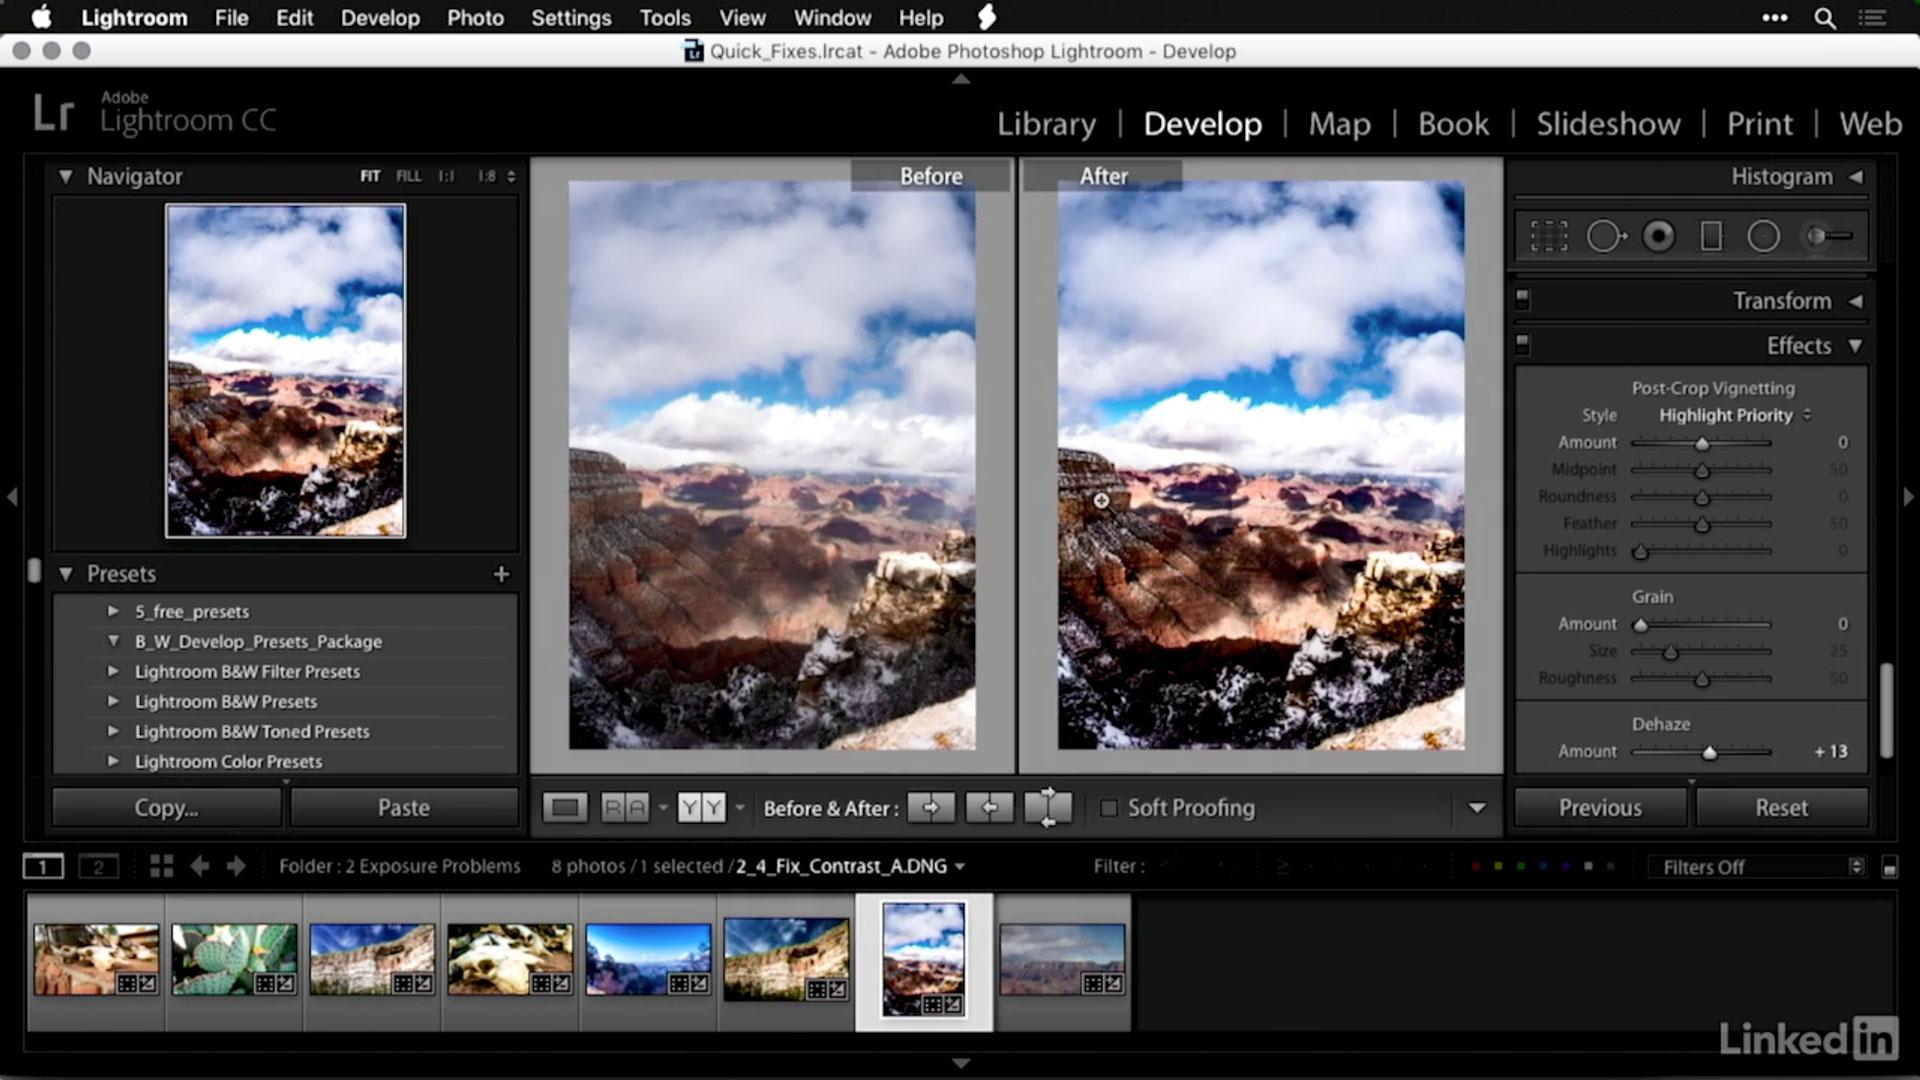 Photofocus | How do I fix a photo that lacks contrast in Lightroom?